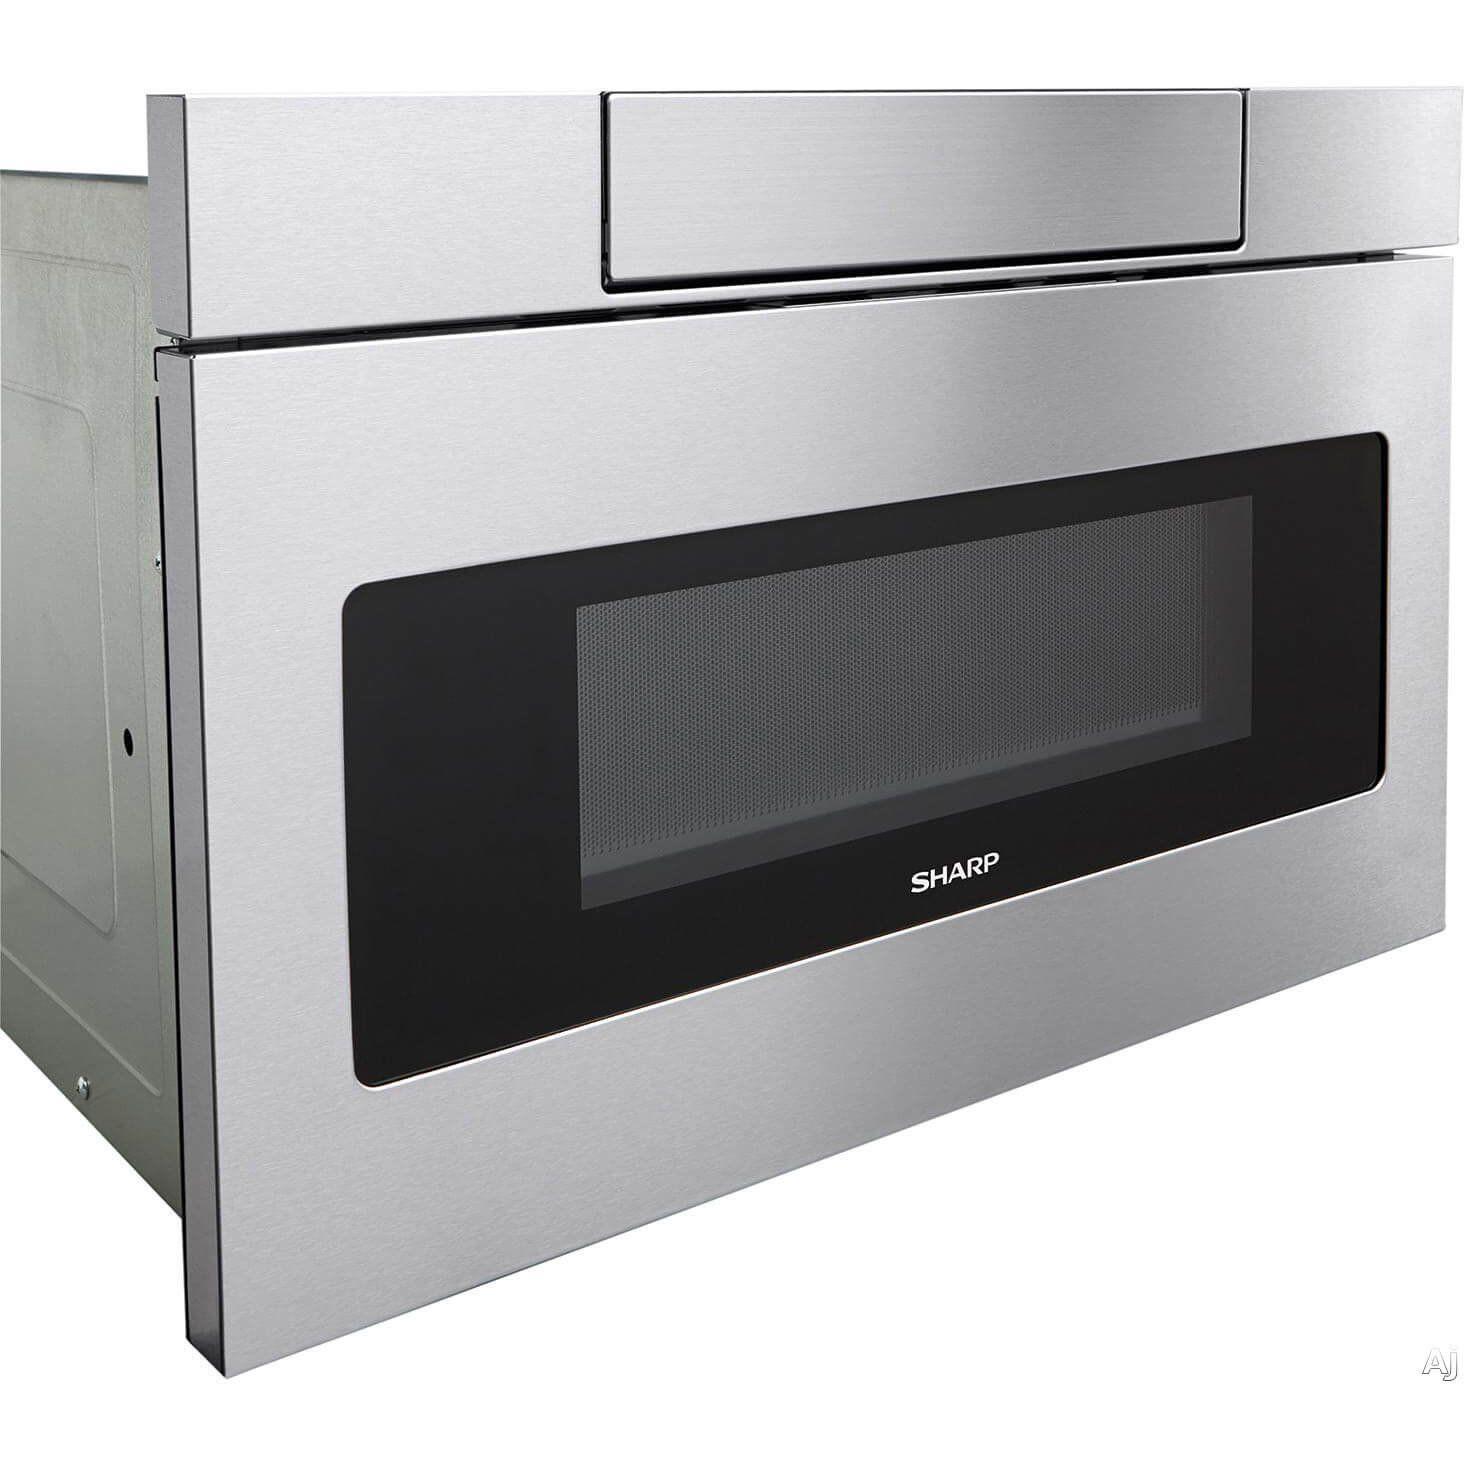 Sharp Microwave Drawer Oven Microwave Drawer Sharp Microwave Drawer Microwave